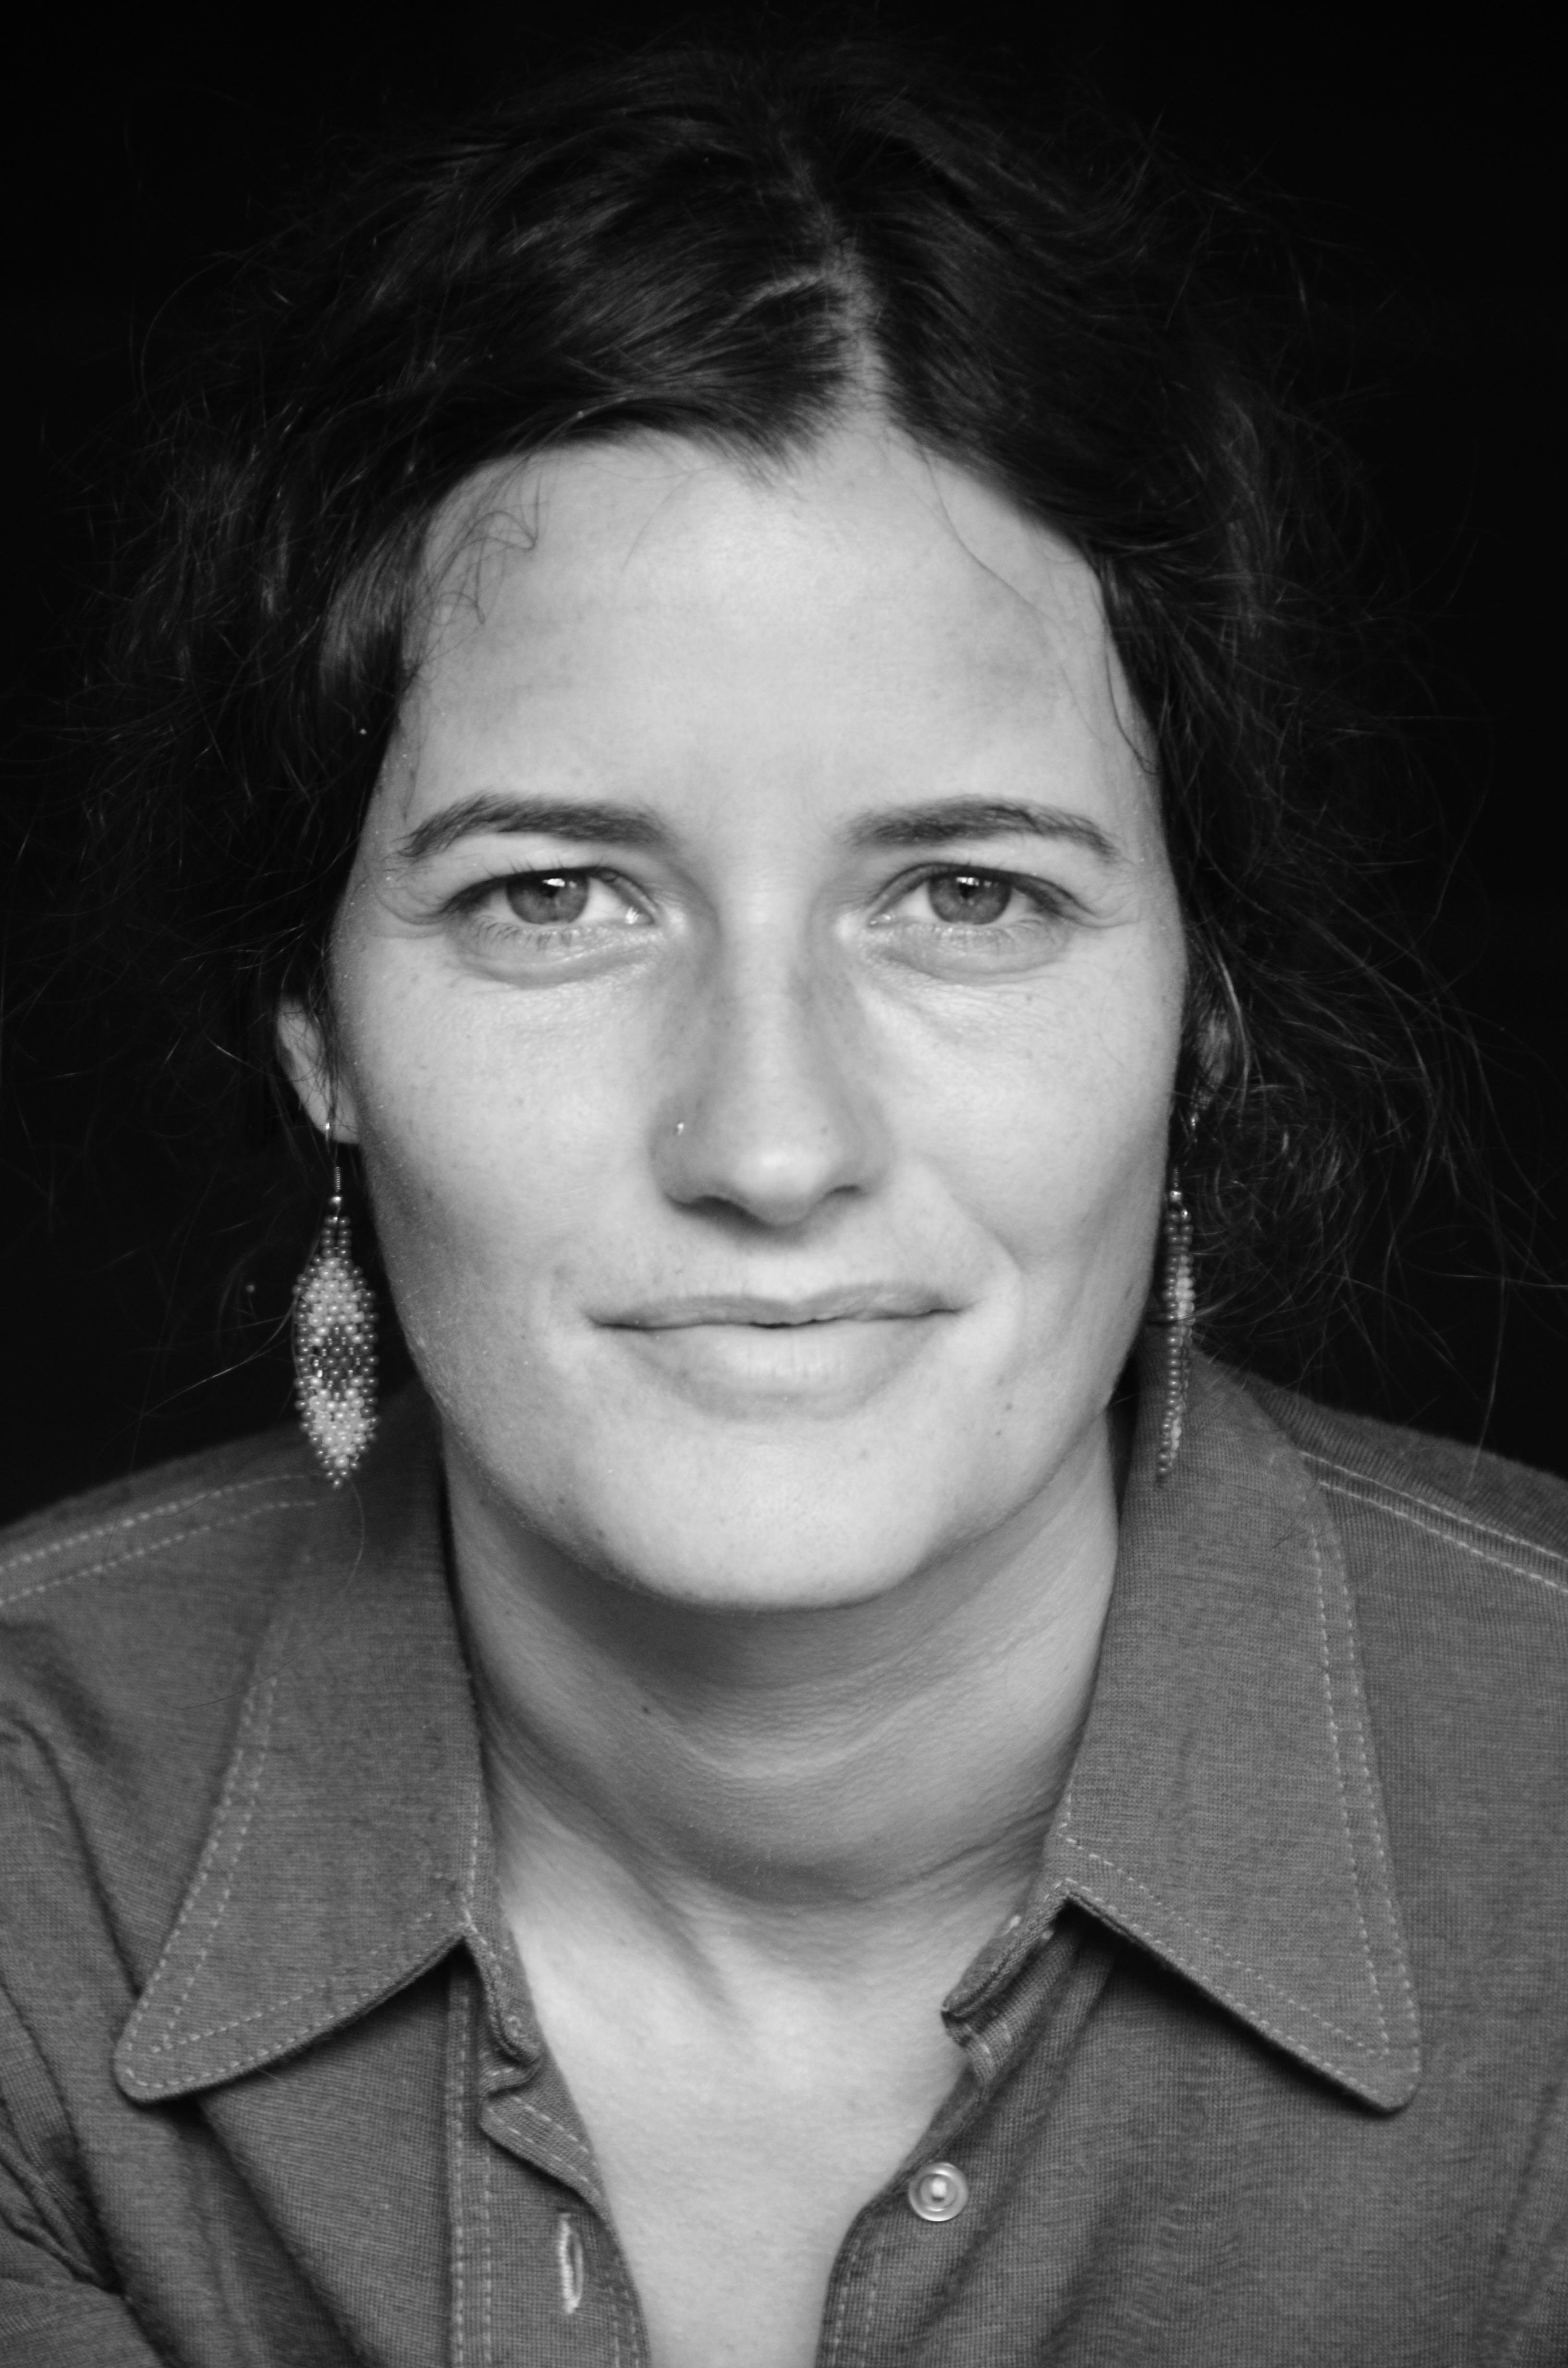 Lisa Hartwick